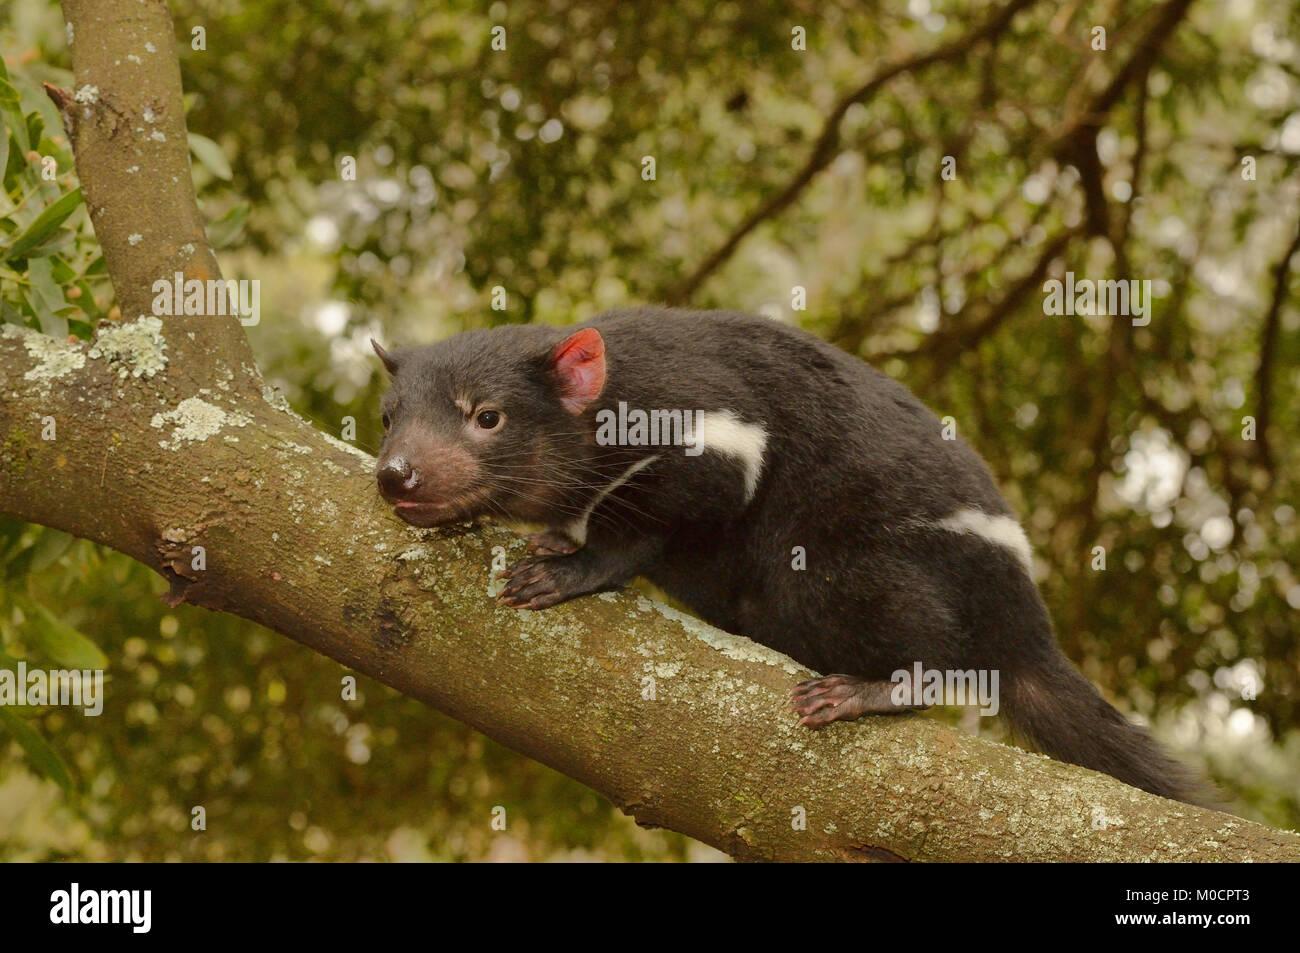 Tasmanian Devil Sarcophilus harrisii Young devil climbing tree Photographed in Tasmania, Australia Stock Photo